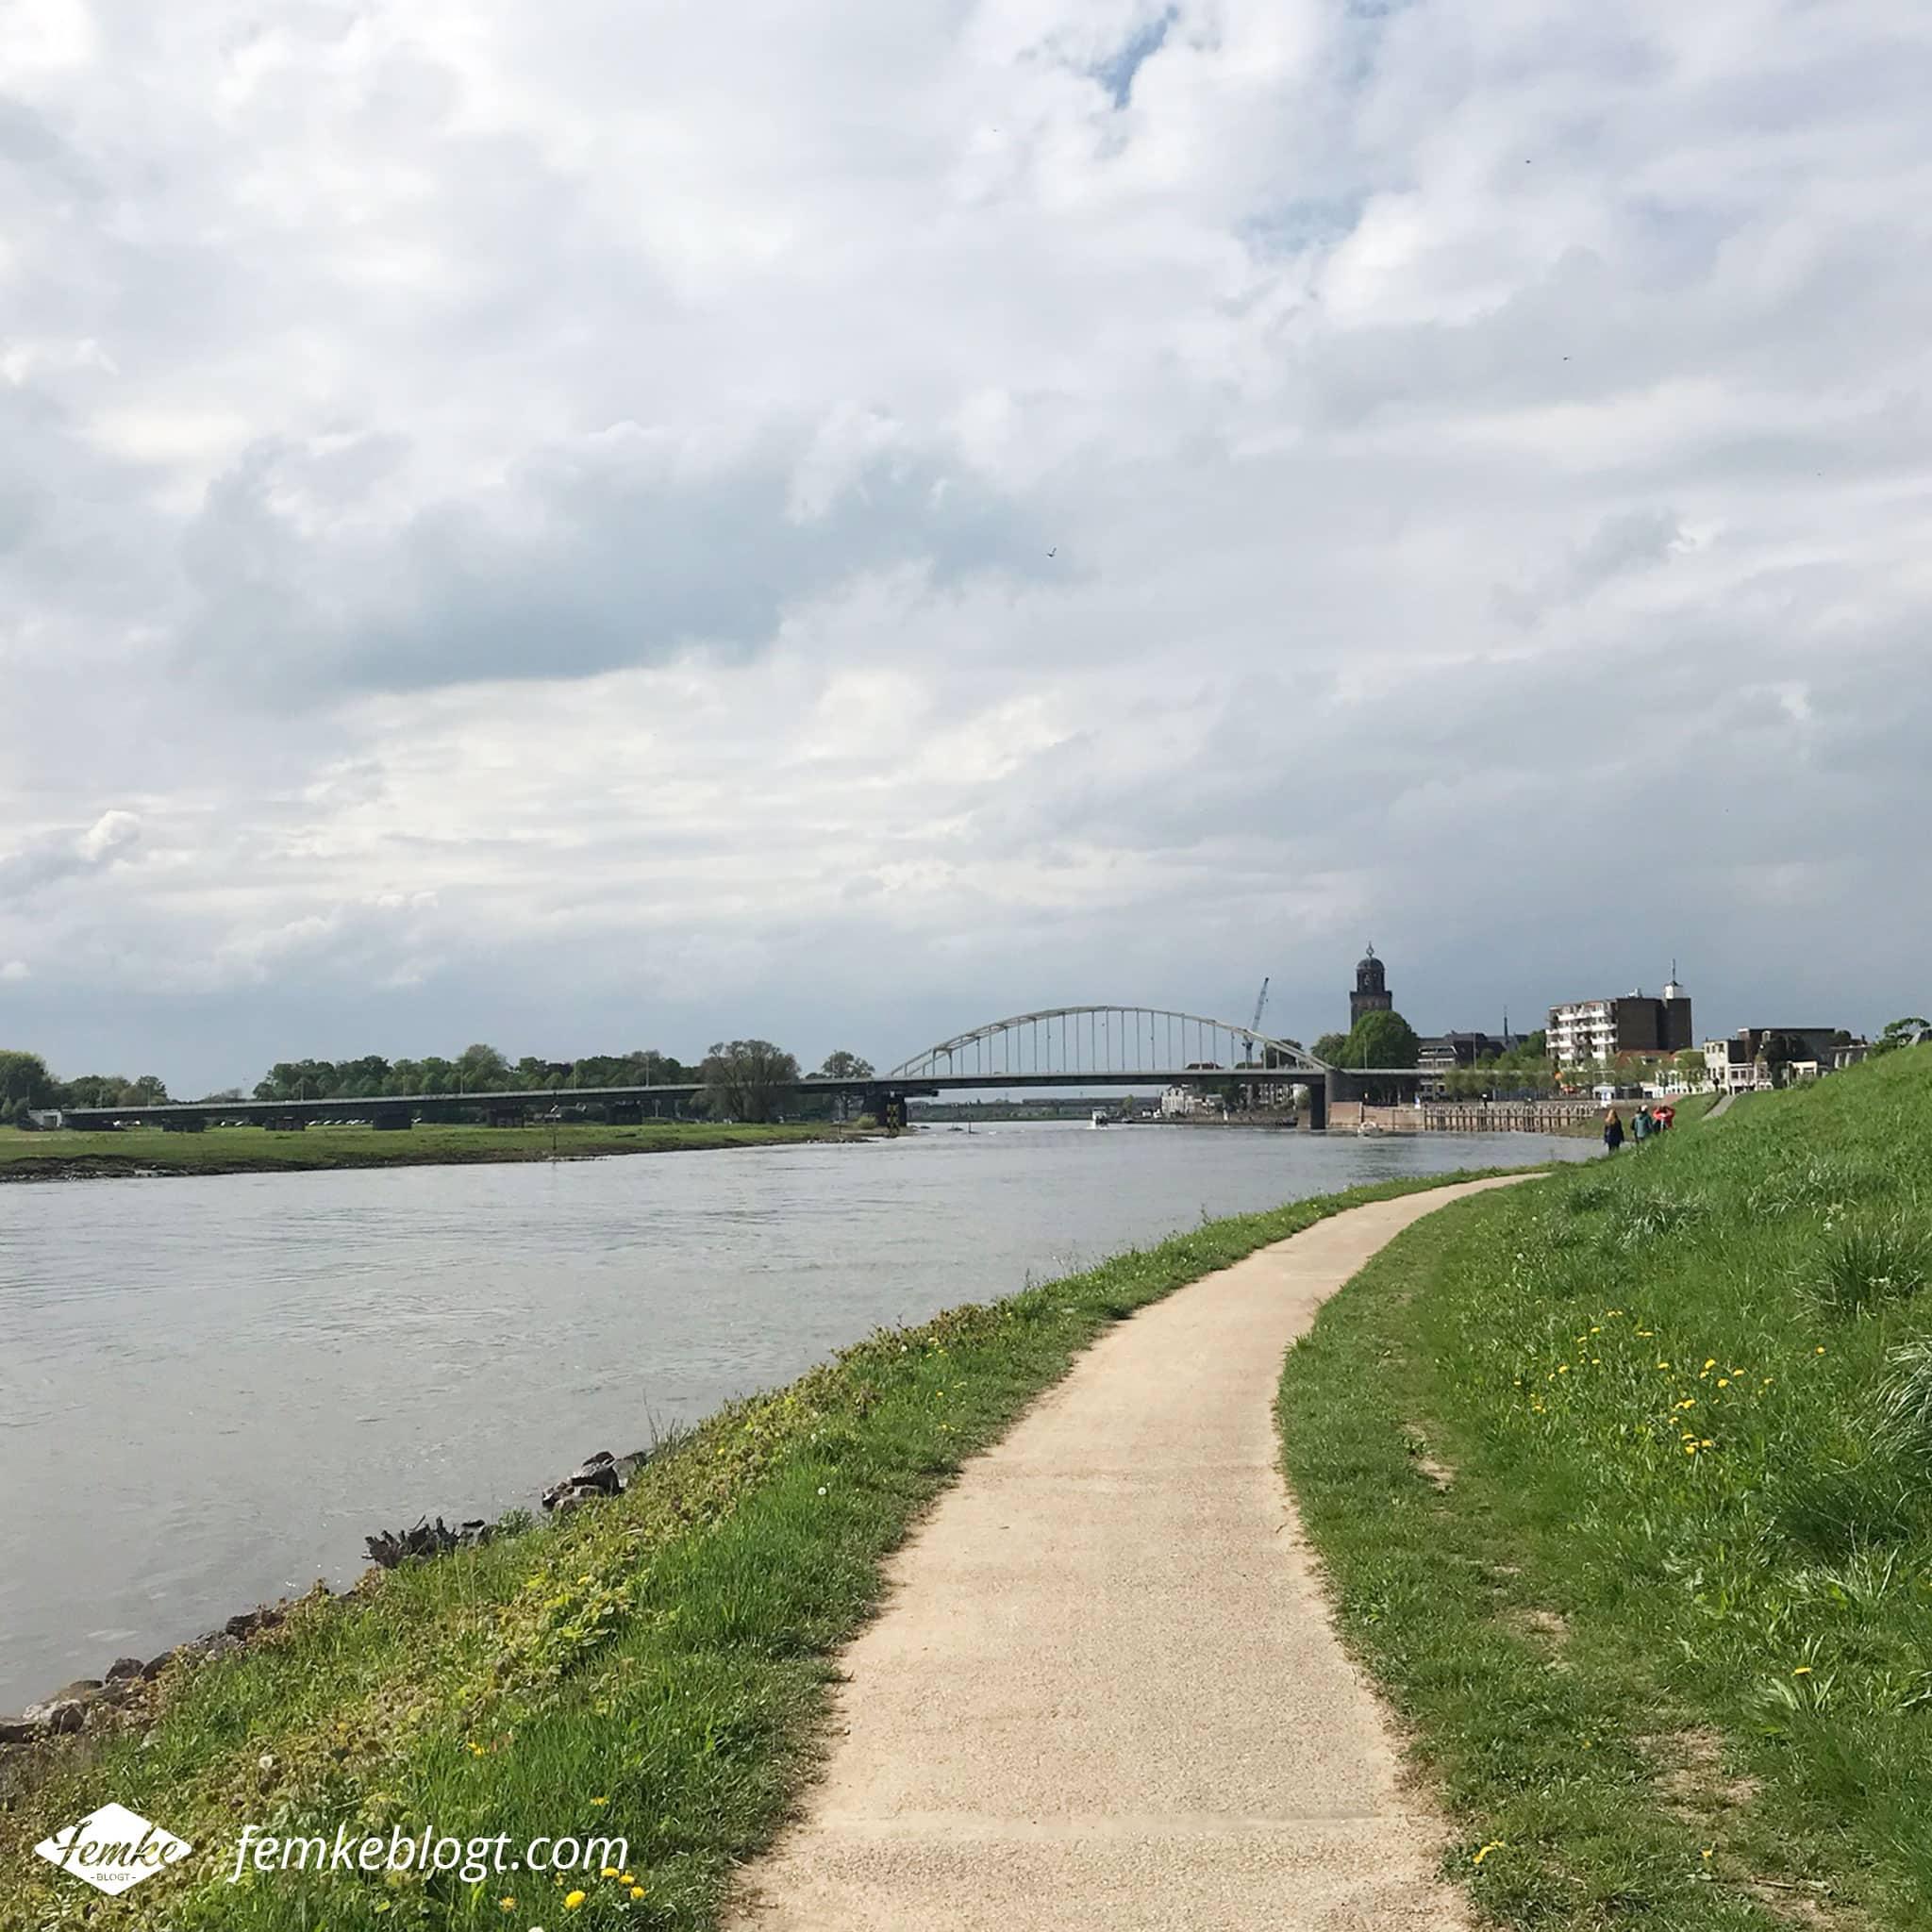 Maandoverzicht april | Hanzestedenpad Zutphen - Deventer